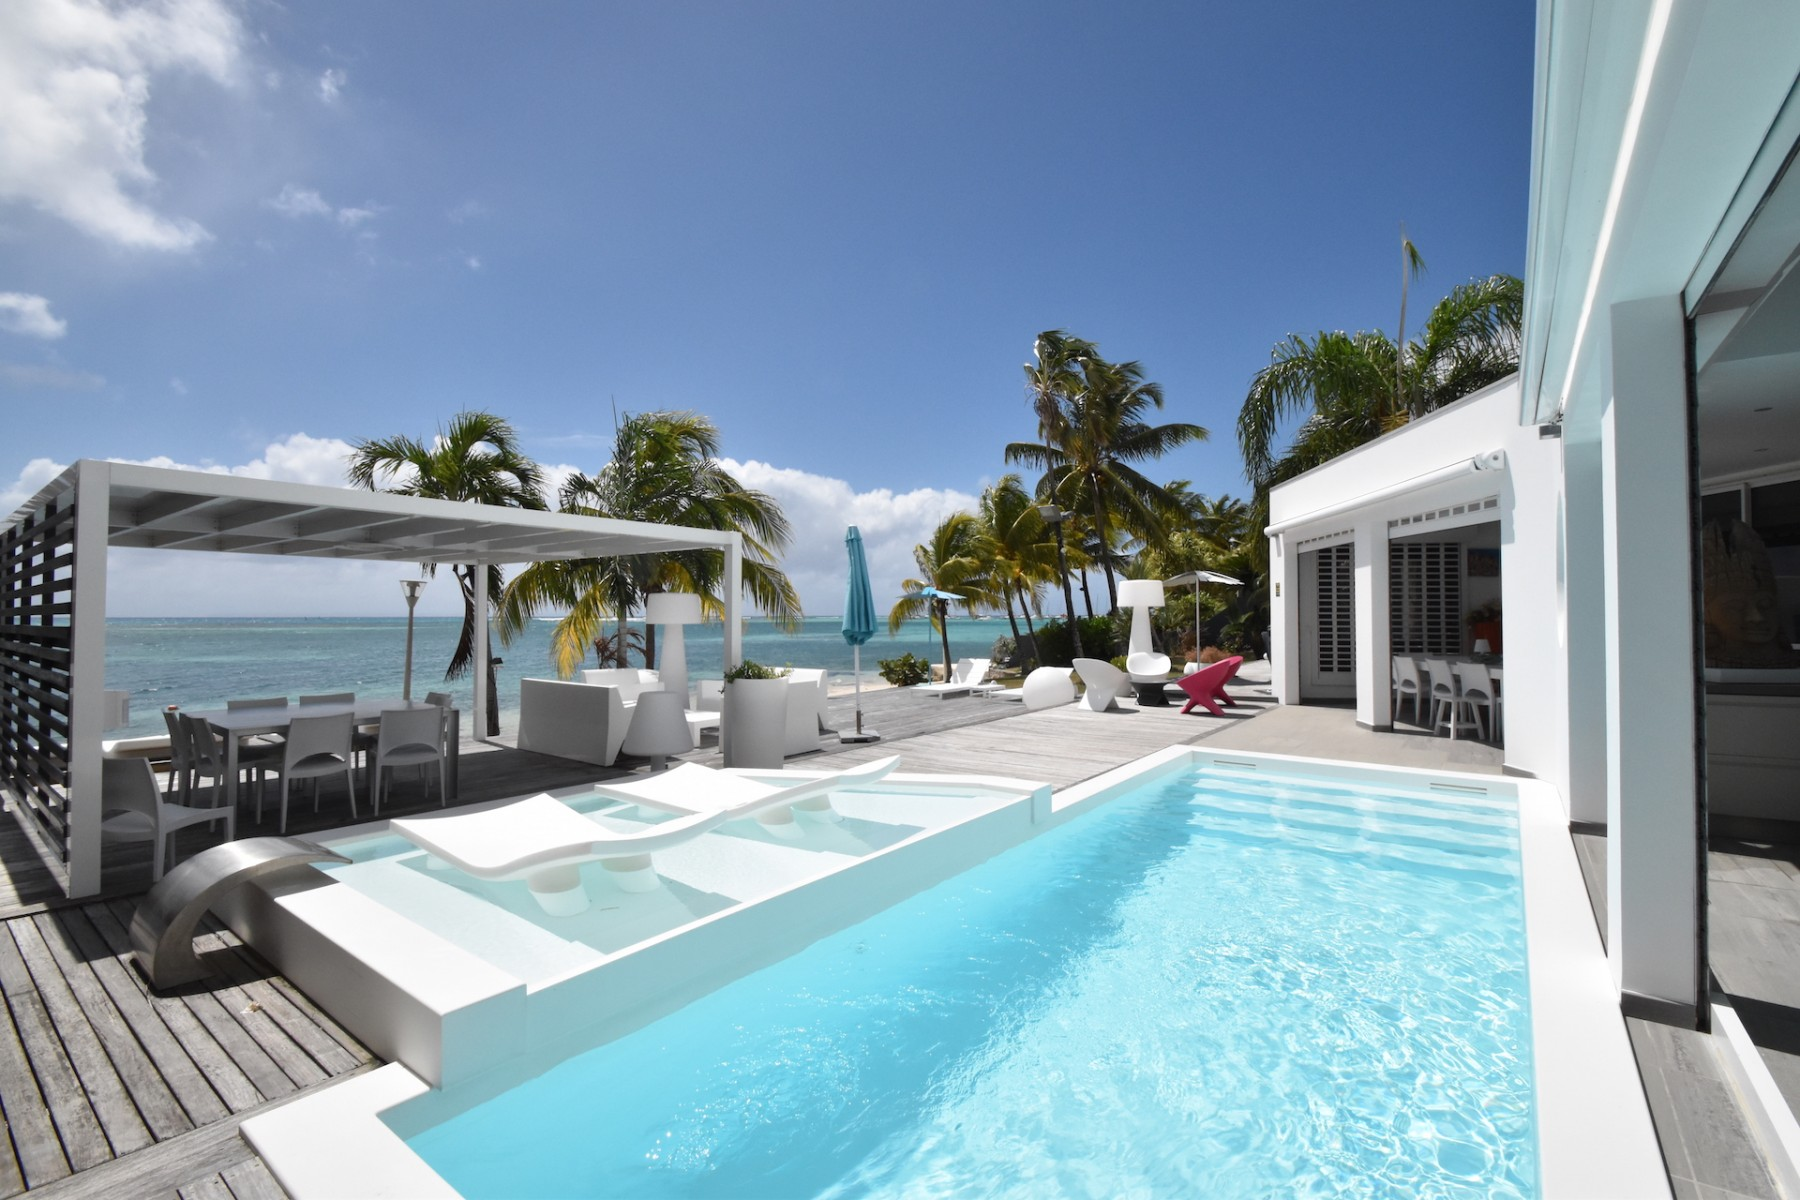 Villa Water Dream Guadeloupe 5 Br Luxury Villa Rental In